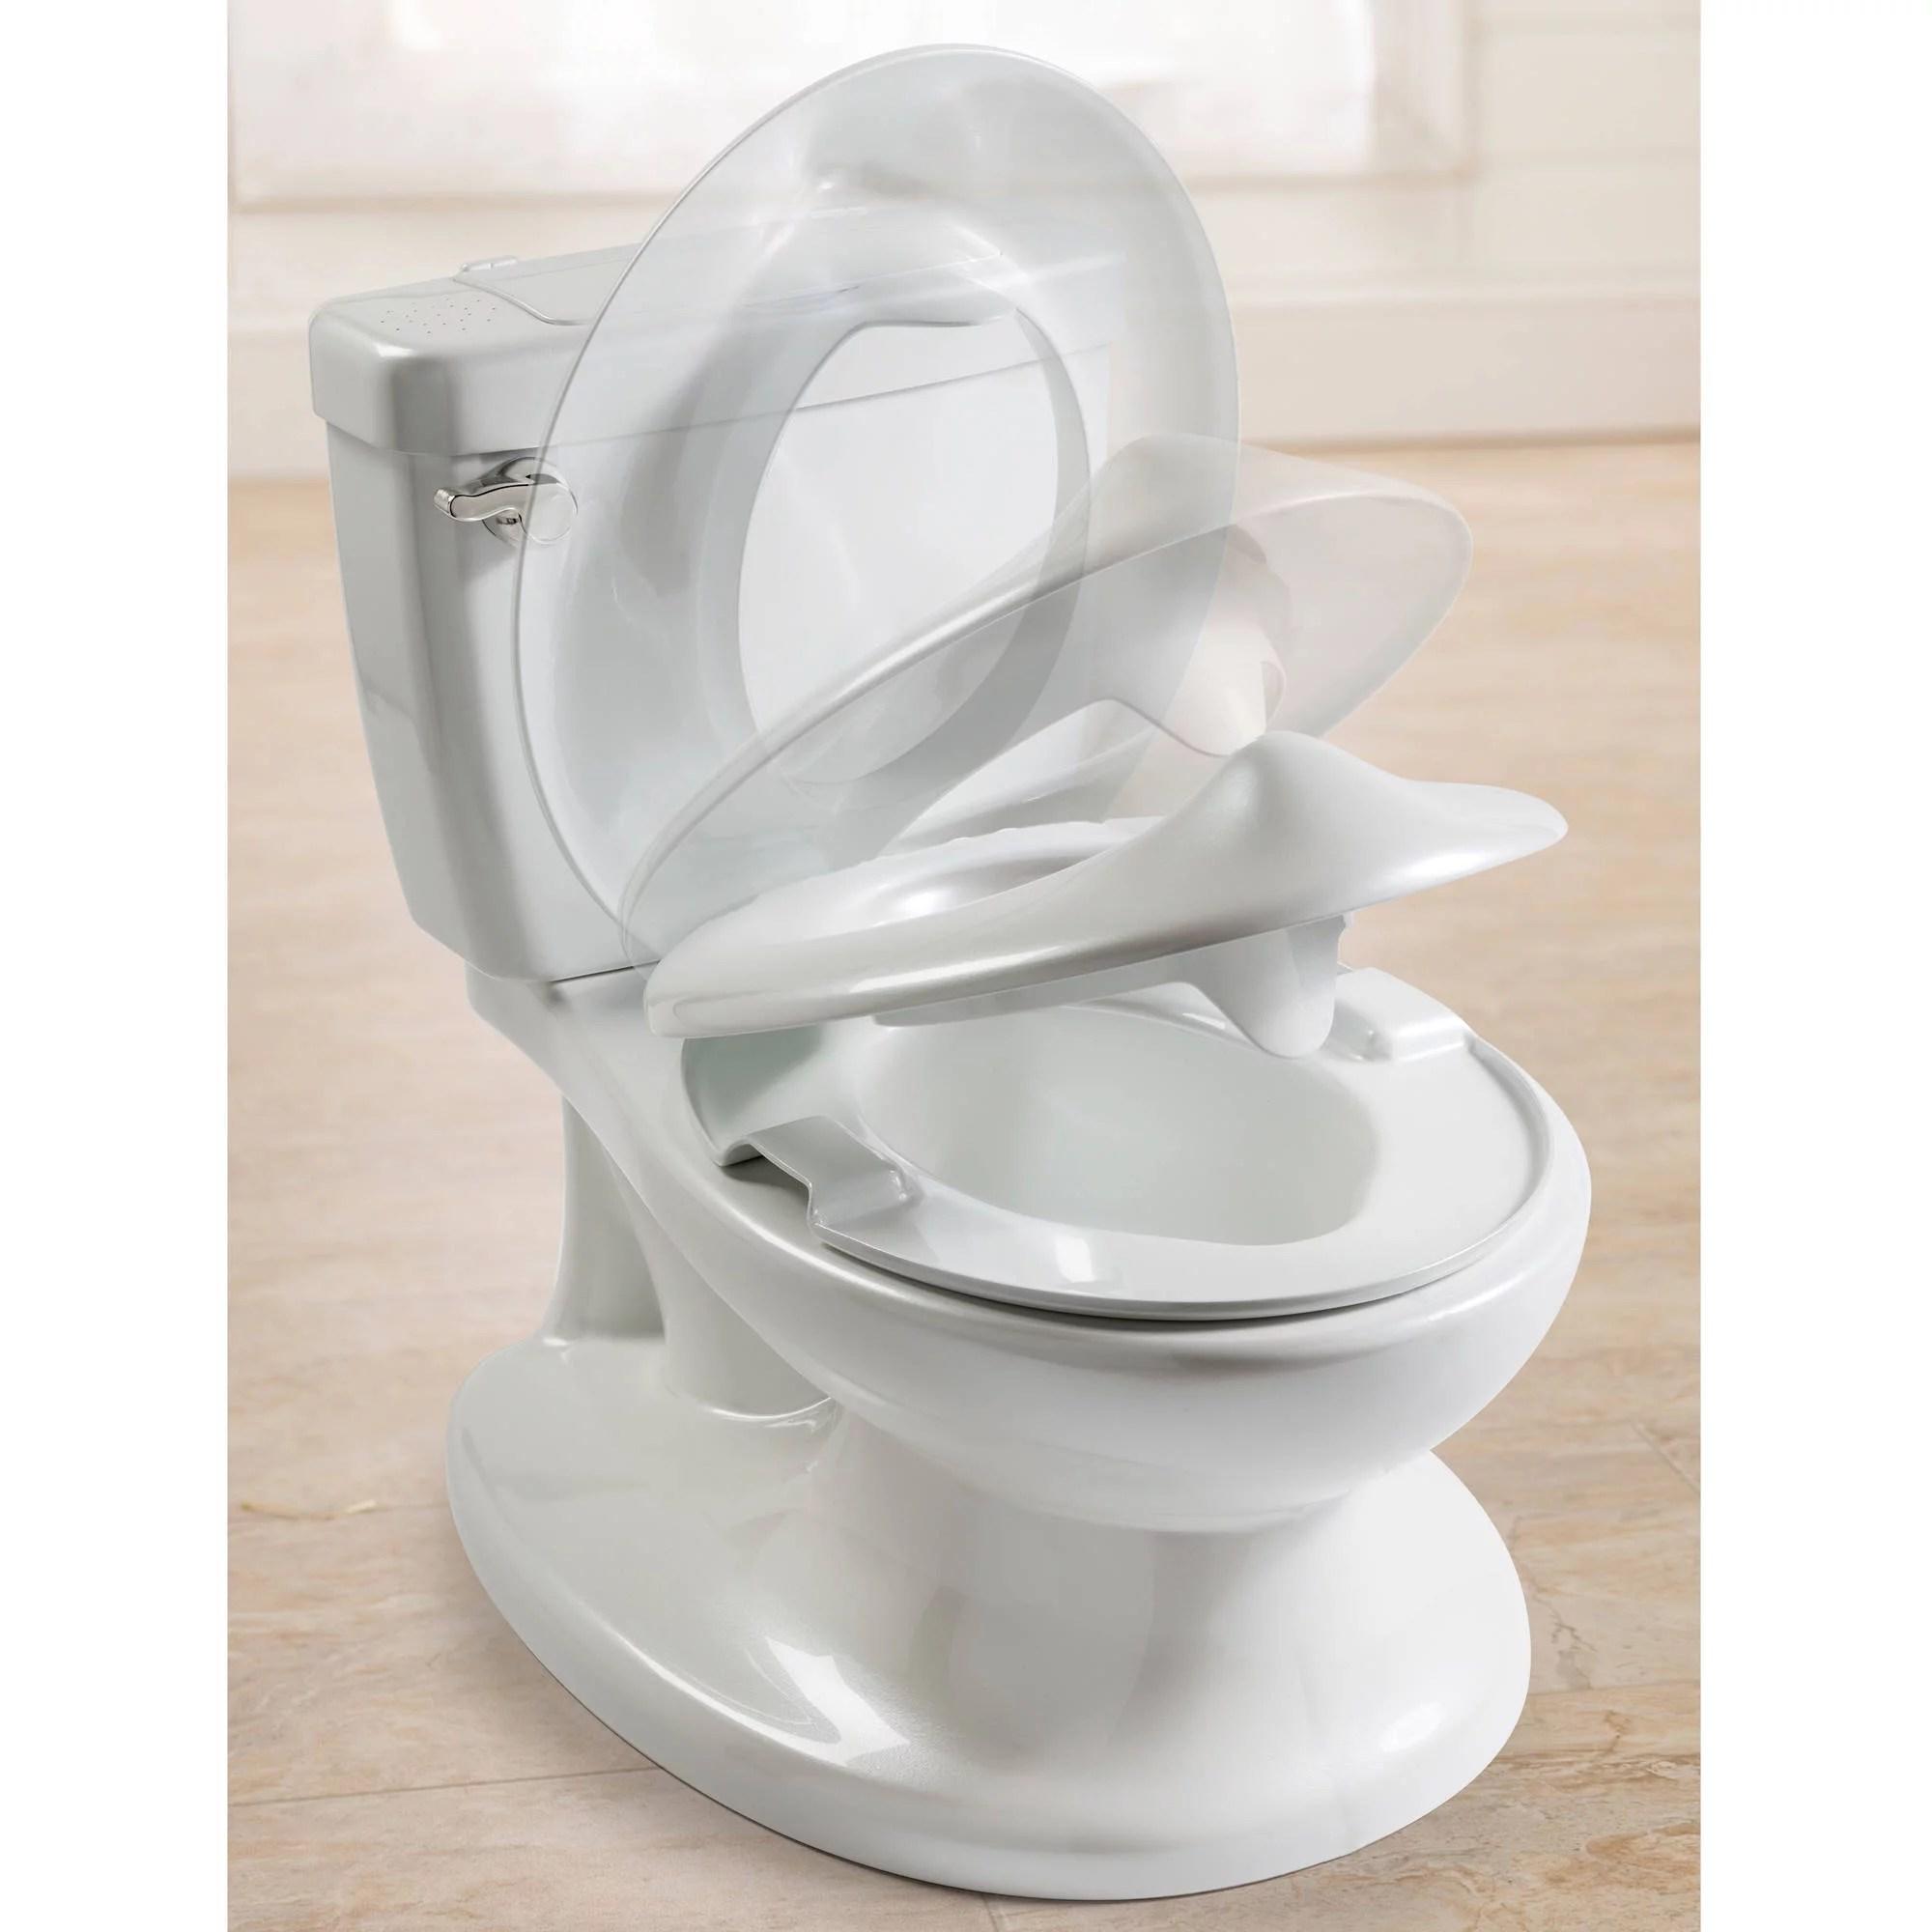 summer potty chair allsteel acuity images usseek